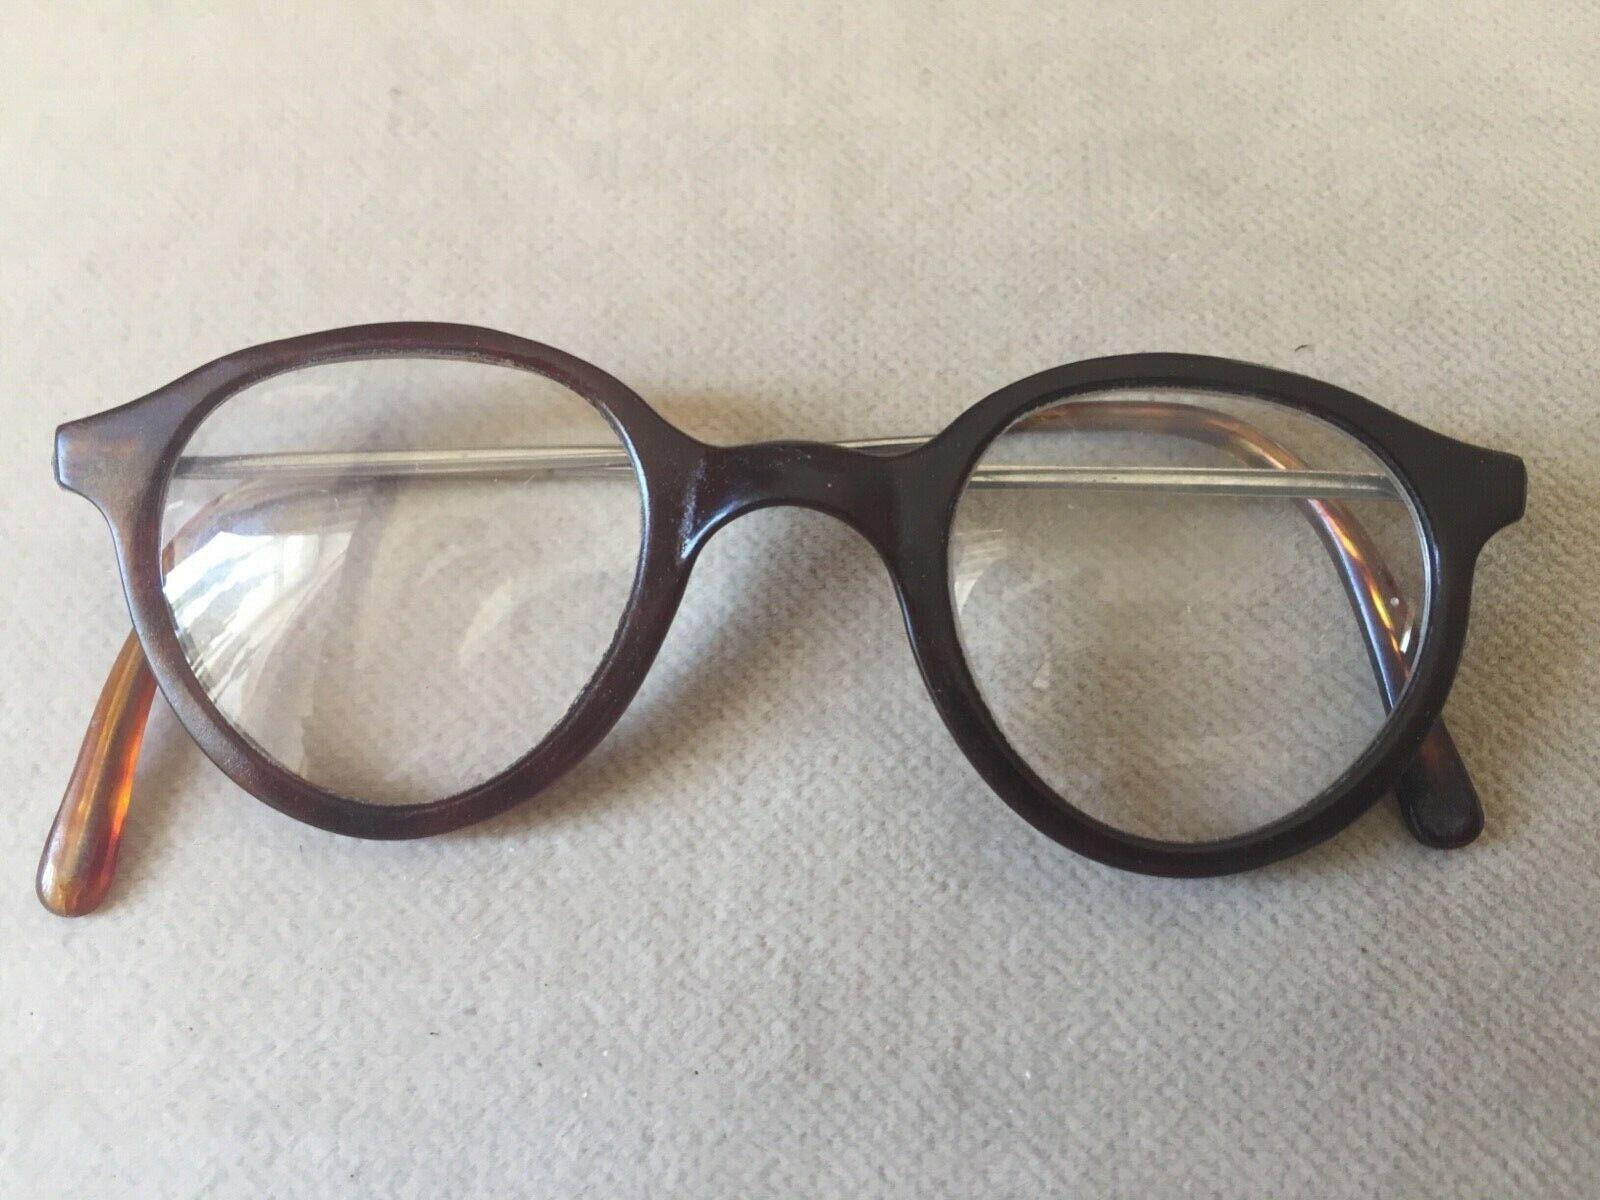 Antik alte ZelluloidHorn Brille, PantoForm, Sattel Steg, ROW, Metall Bügel